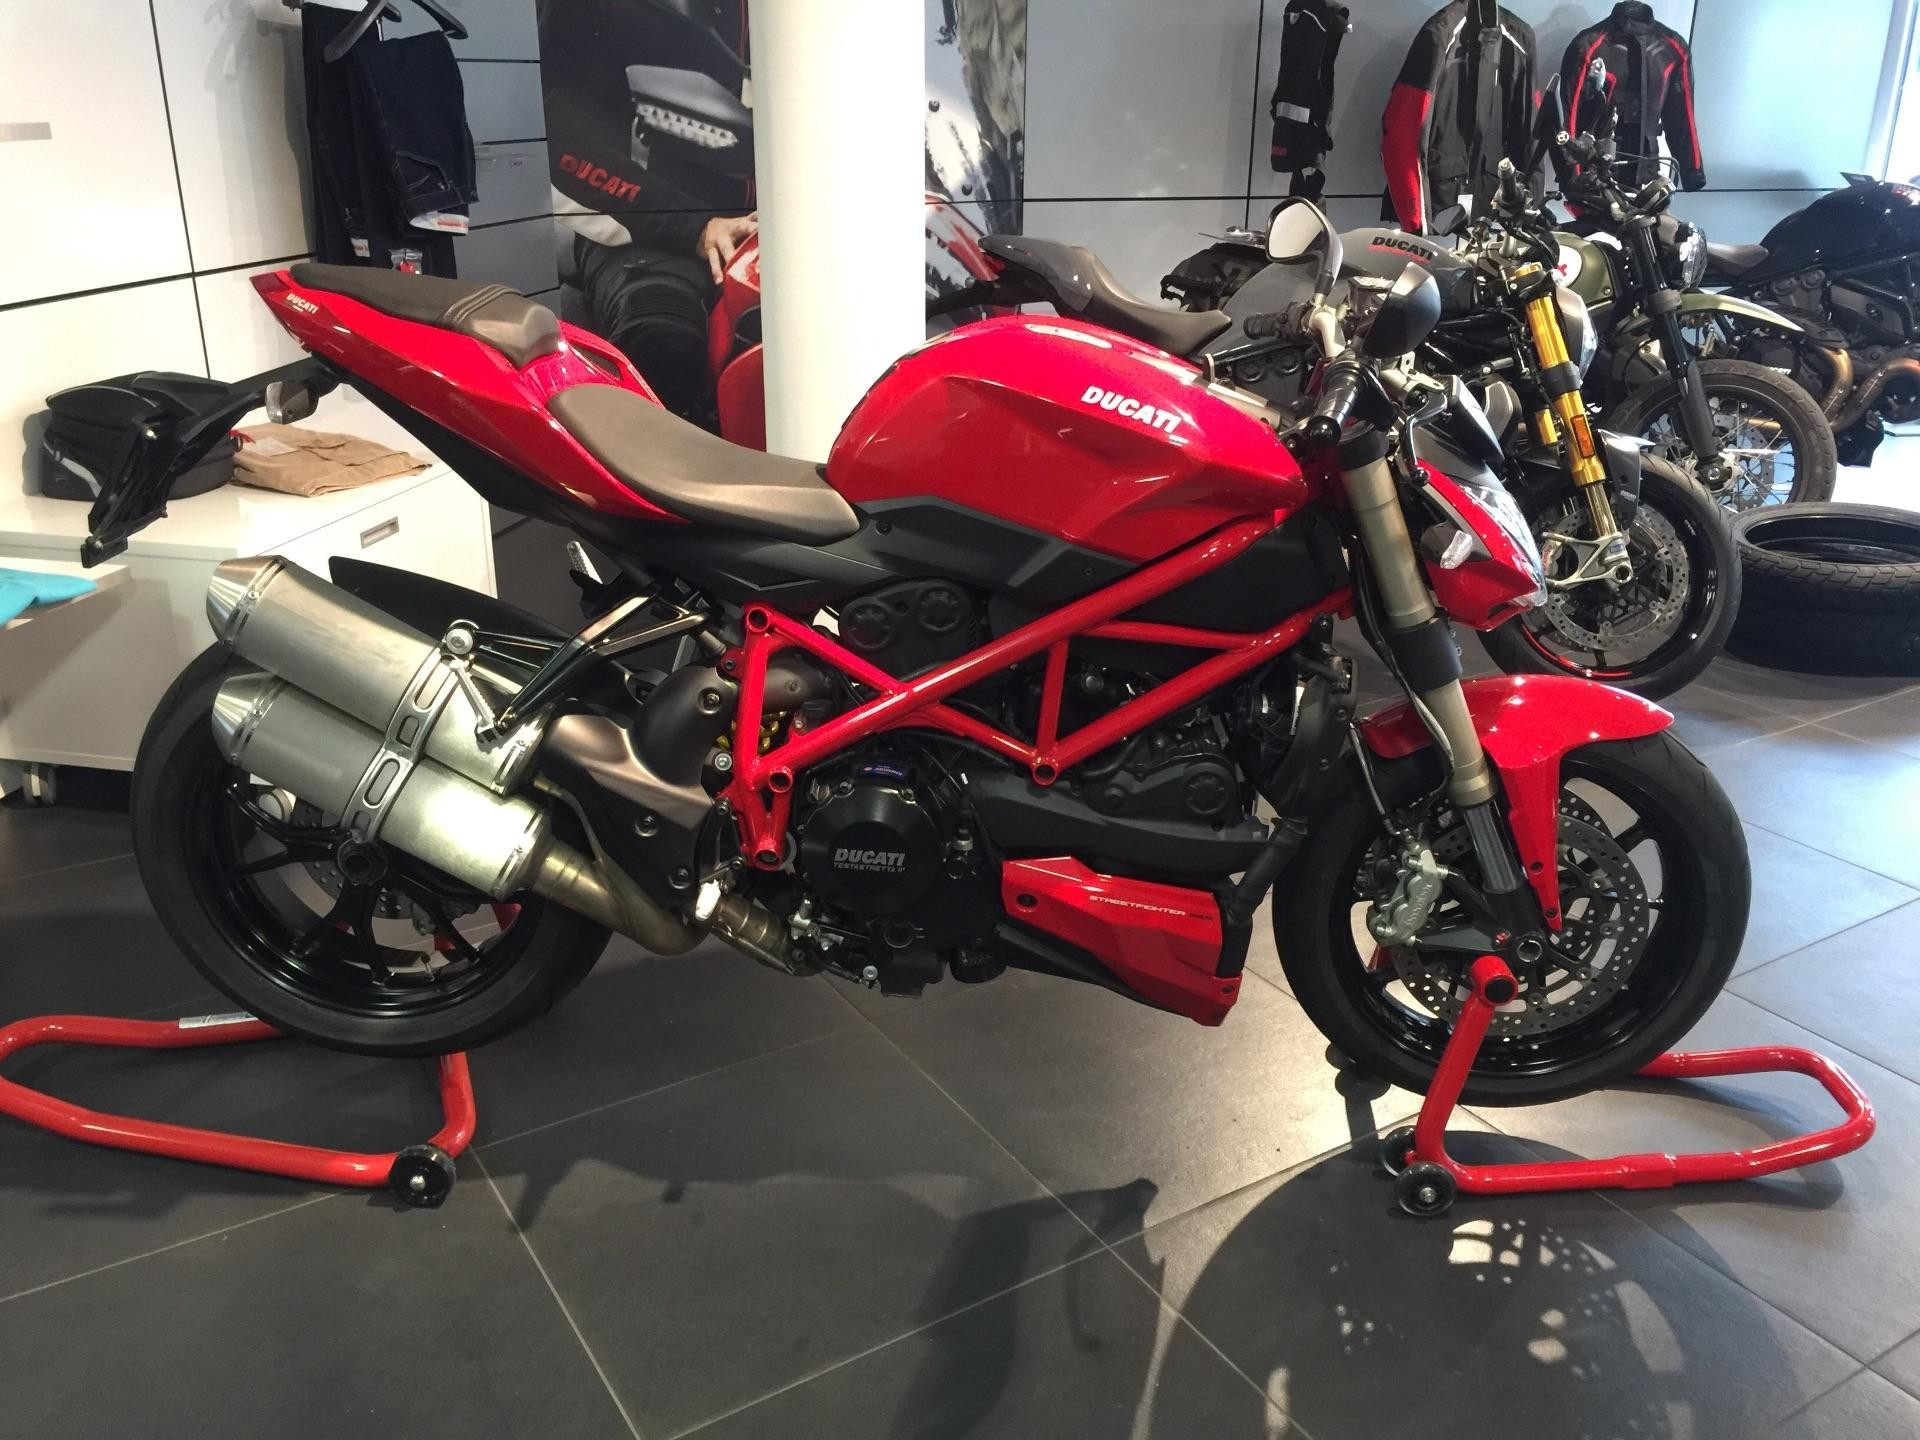 motorrad occasion kaufen ducati 848 streetfighter ducati basel basel. Black Bedroom Furniture Sets. Home Design Ideas